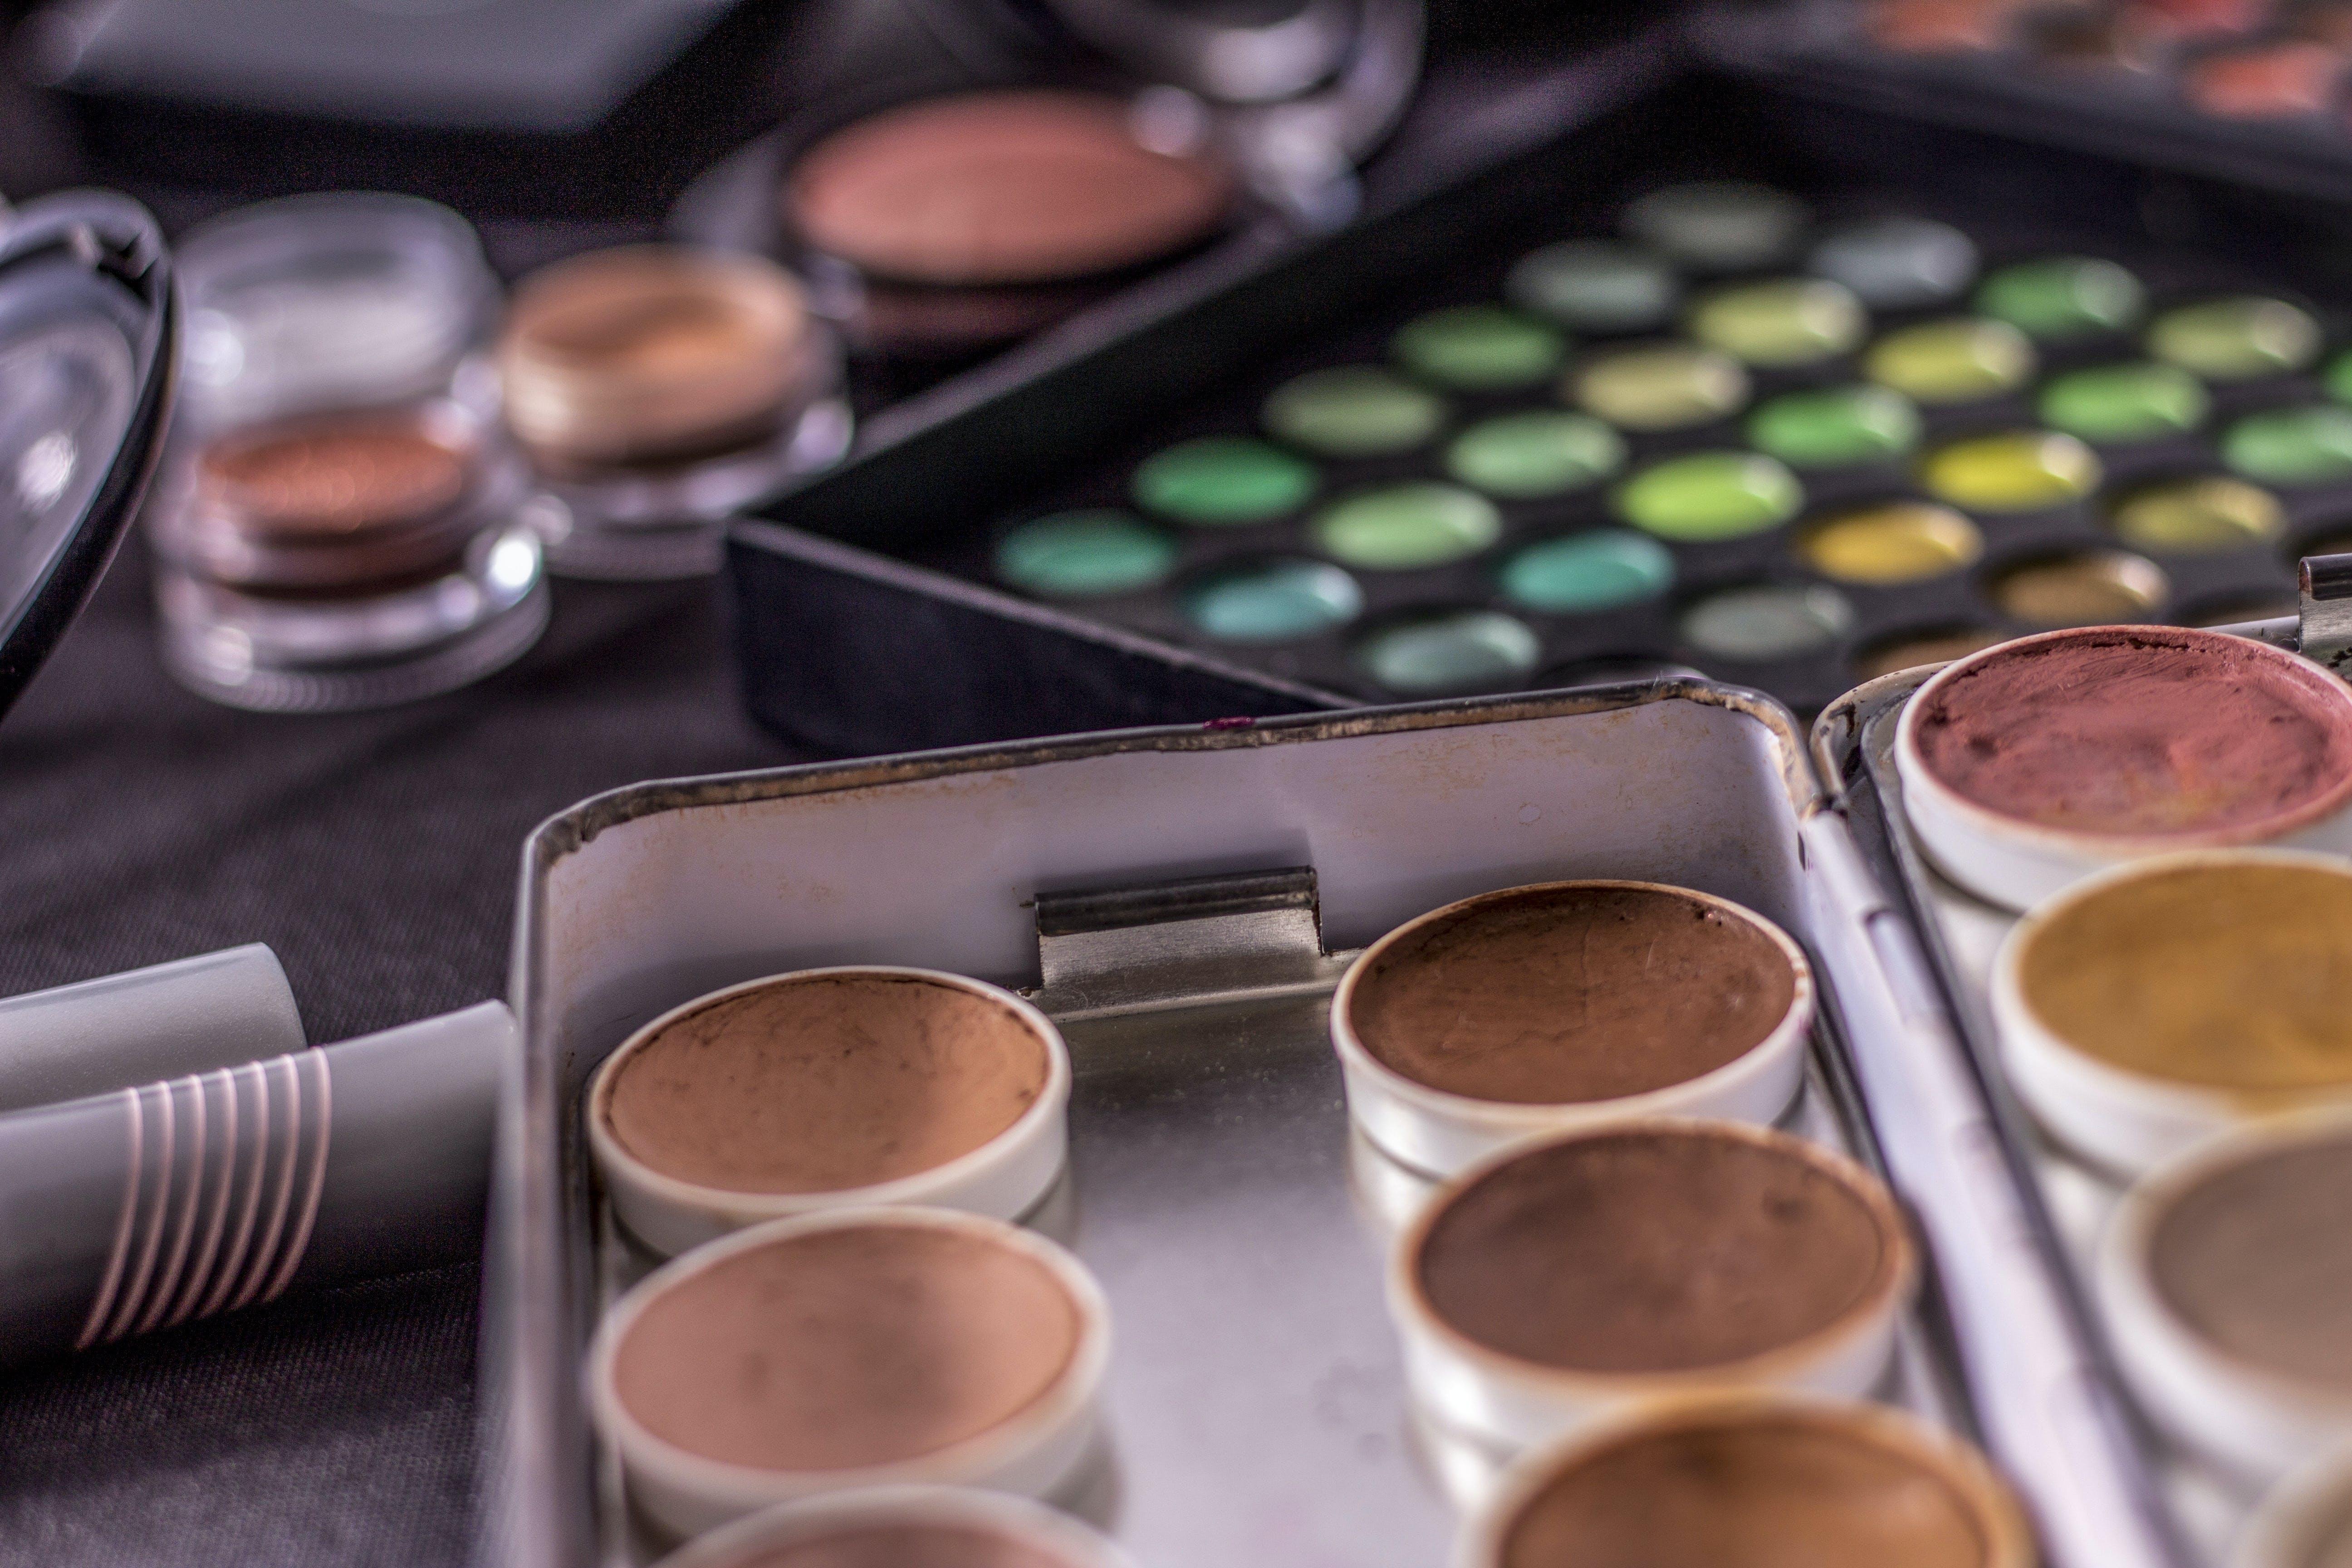 Makeup Palette Kit